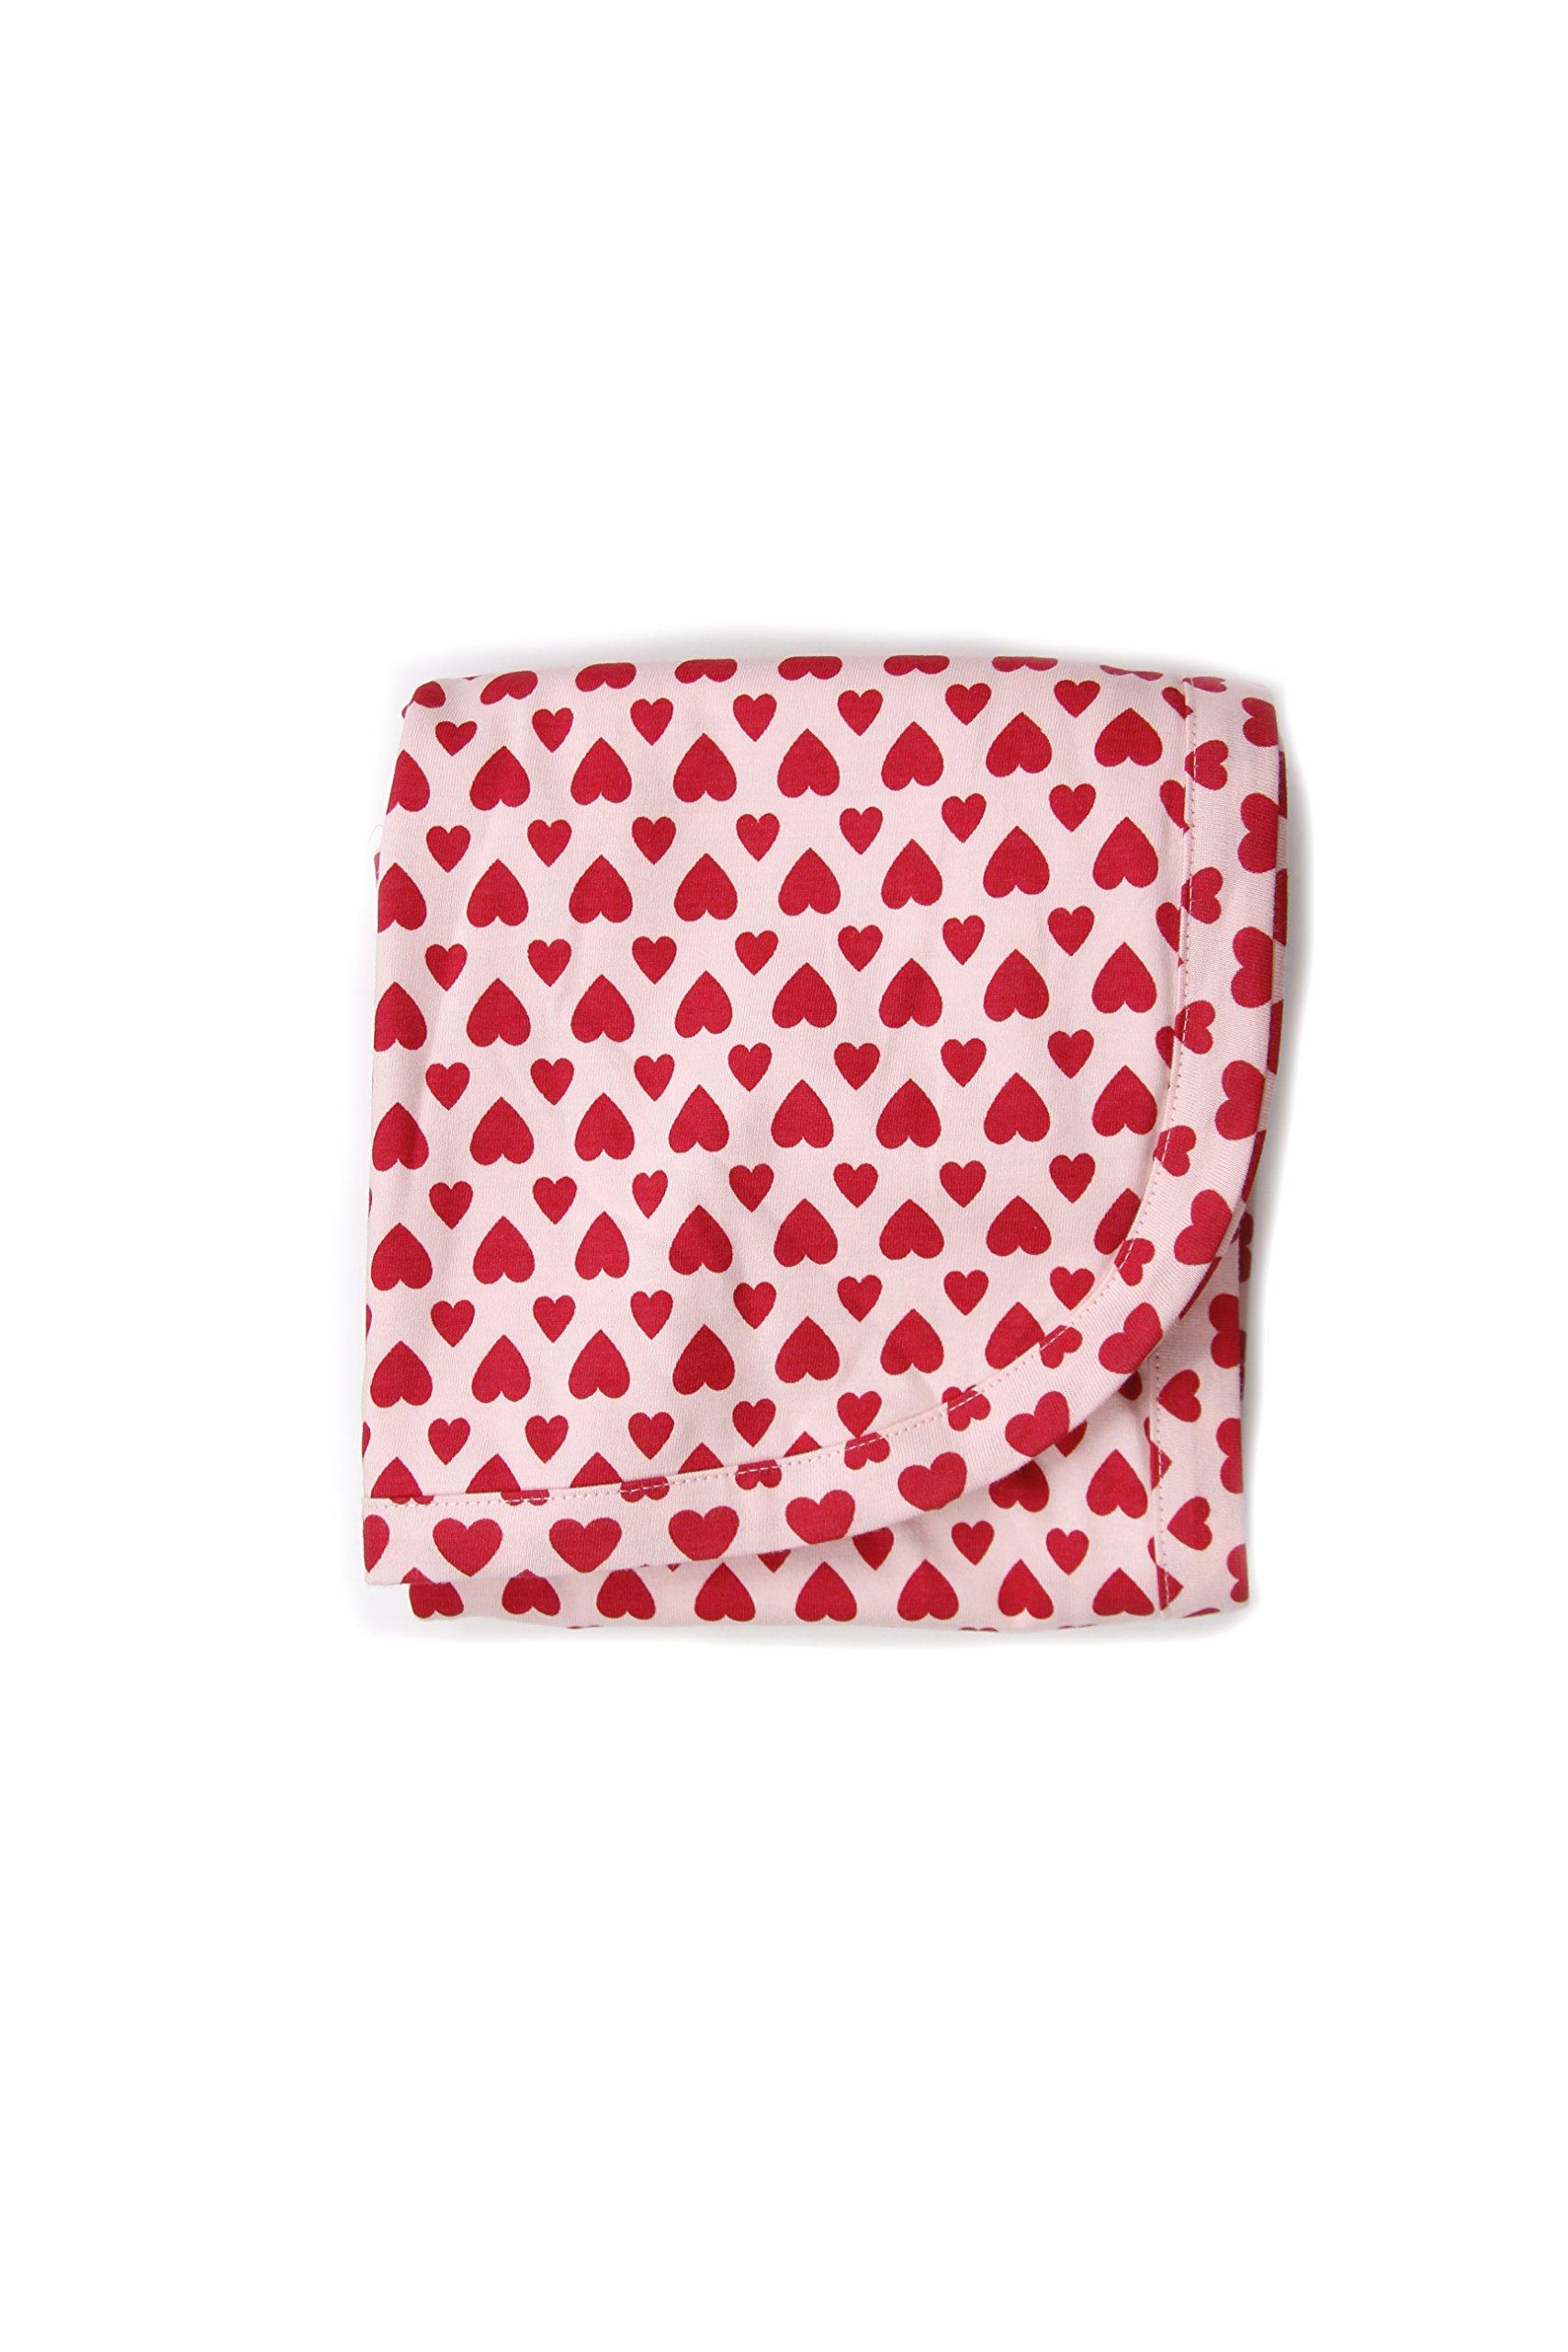 Kate Quinn Organic Unisex-Baby Receiving Blanket, OneSize (Love)